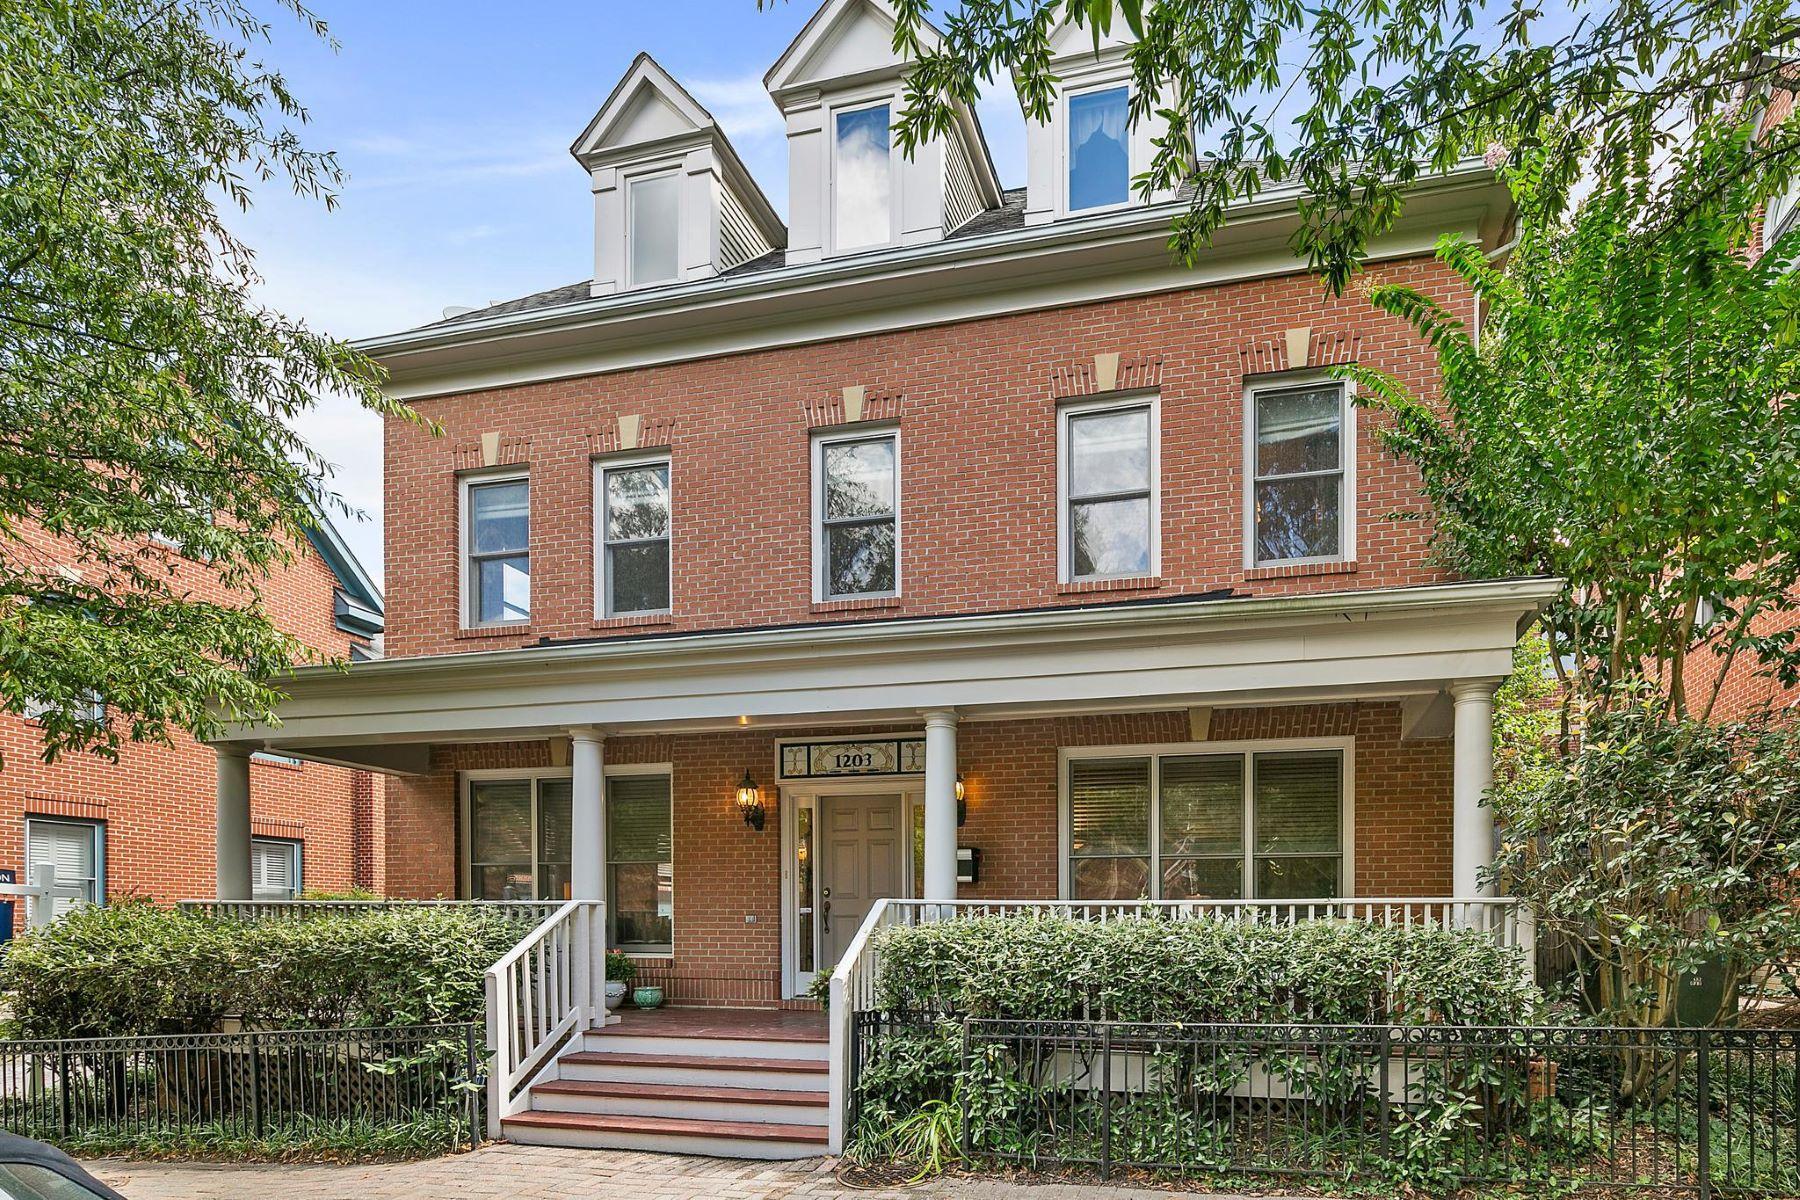 Single Family Homes for Active at 1203 N Johnson St Arlington, Virginia 22201 United States